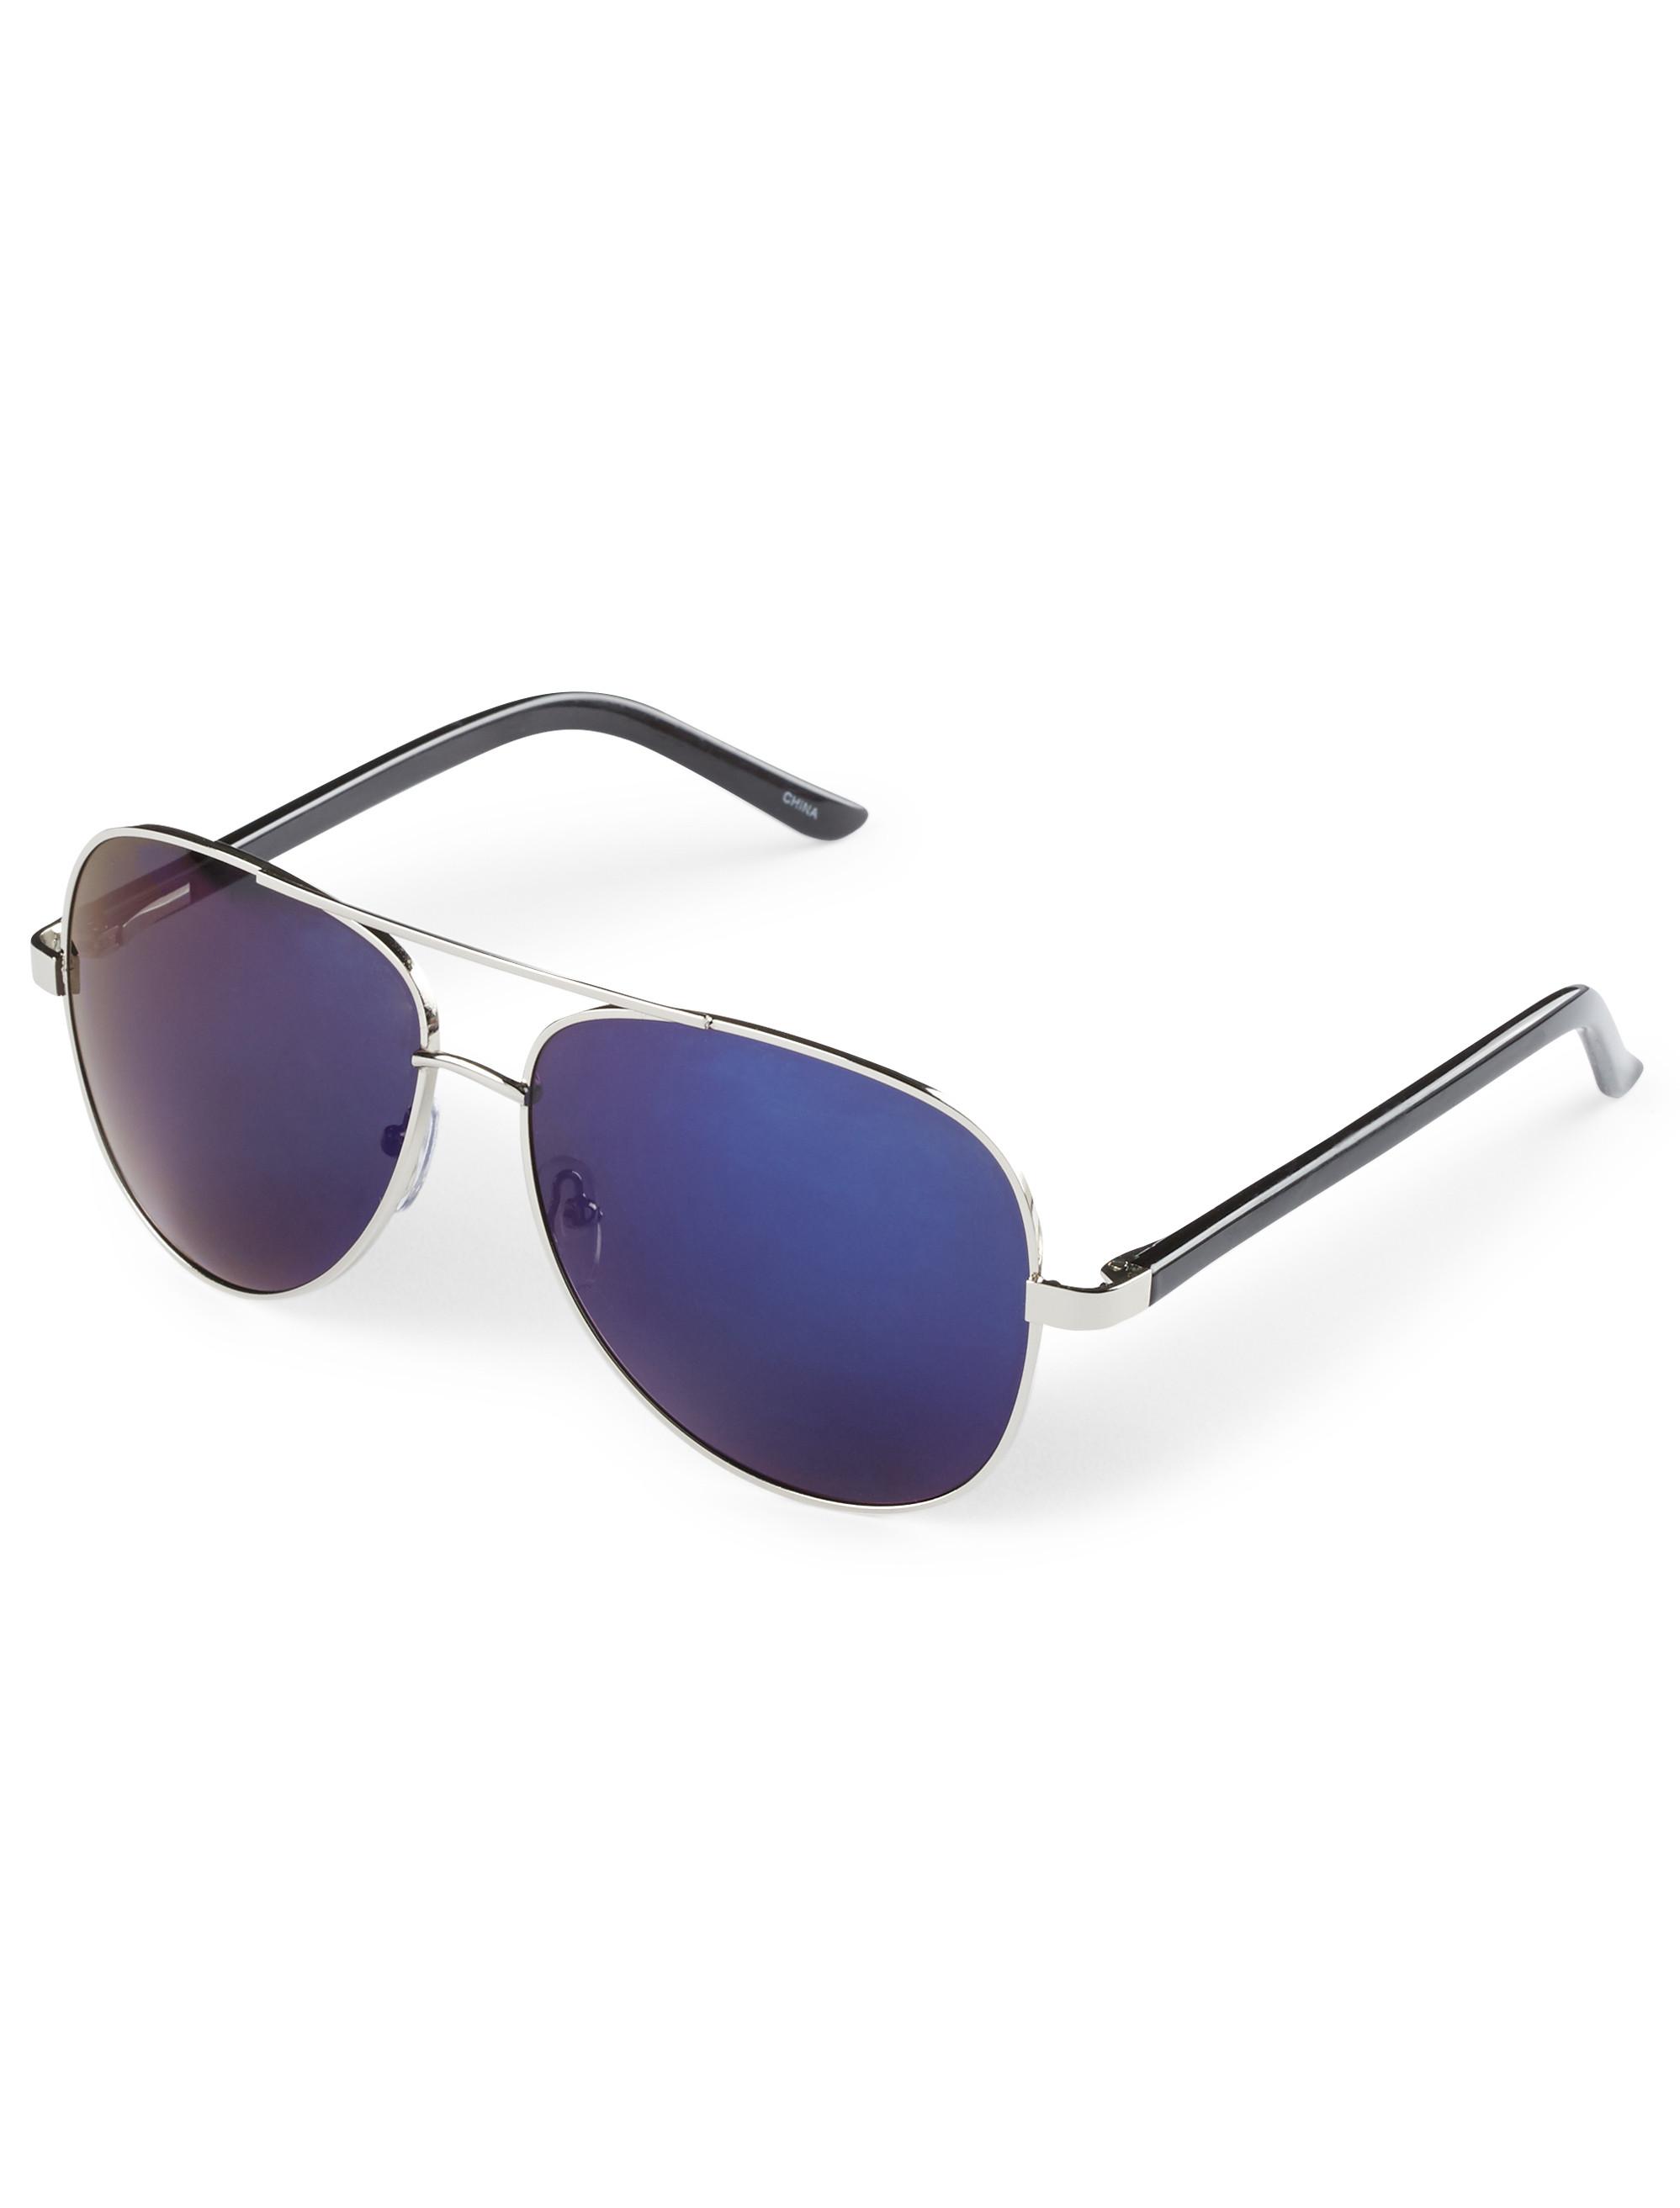 f1d30d5f8e mirrored lens silver aviator sunglasses 1535zu available via PricePi ...